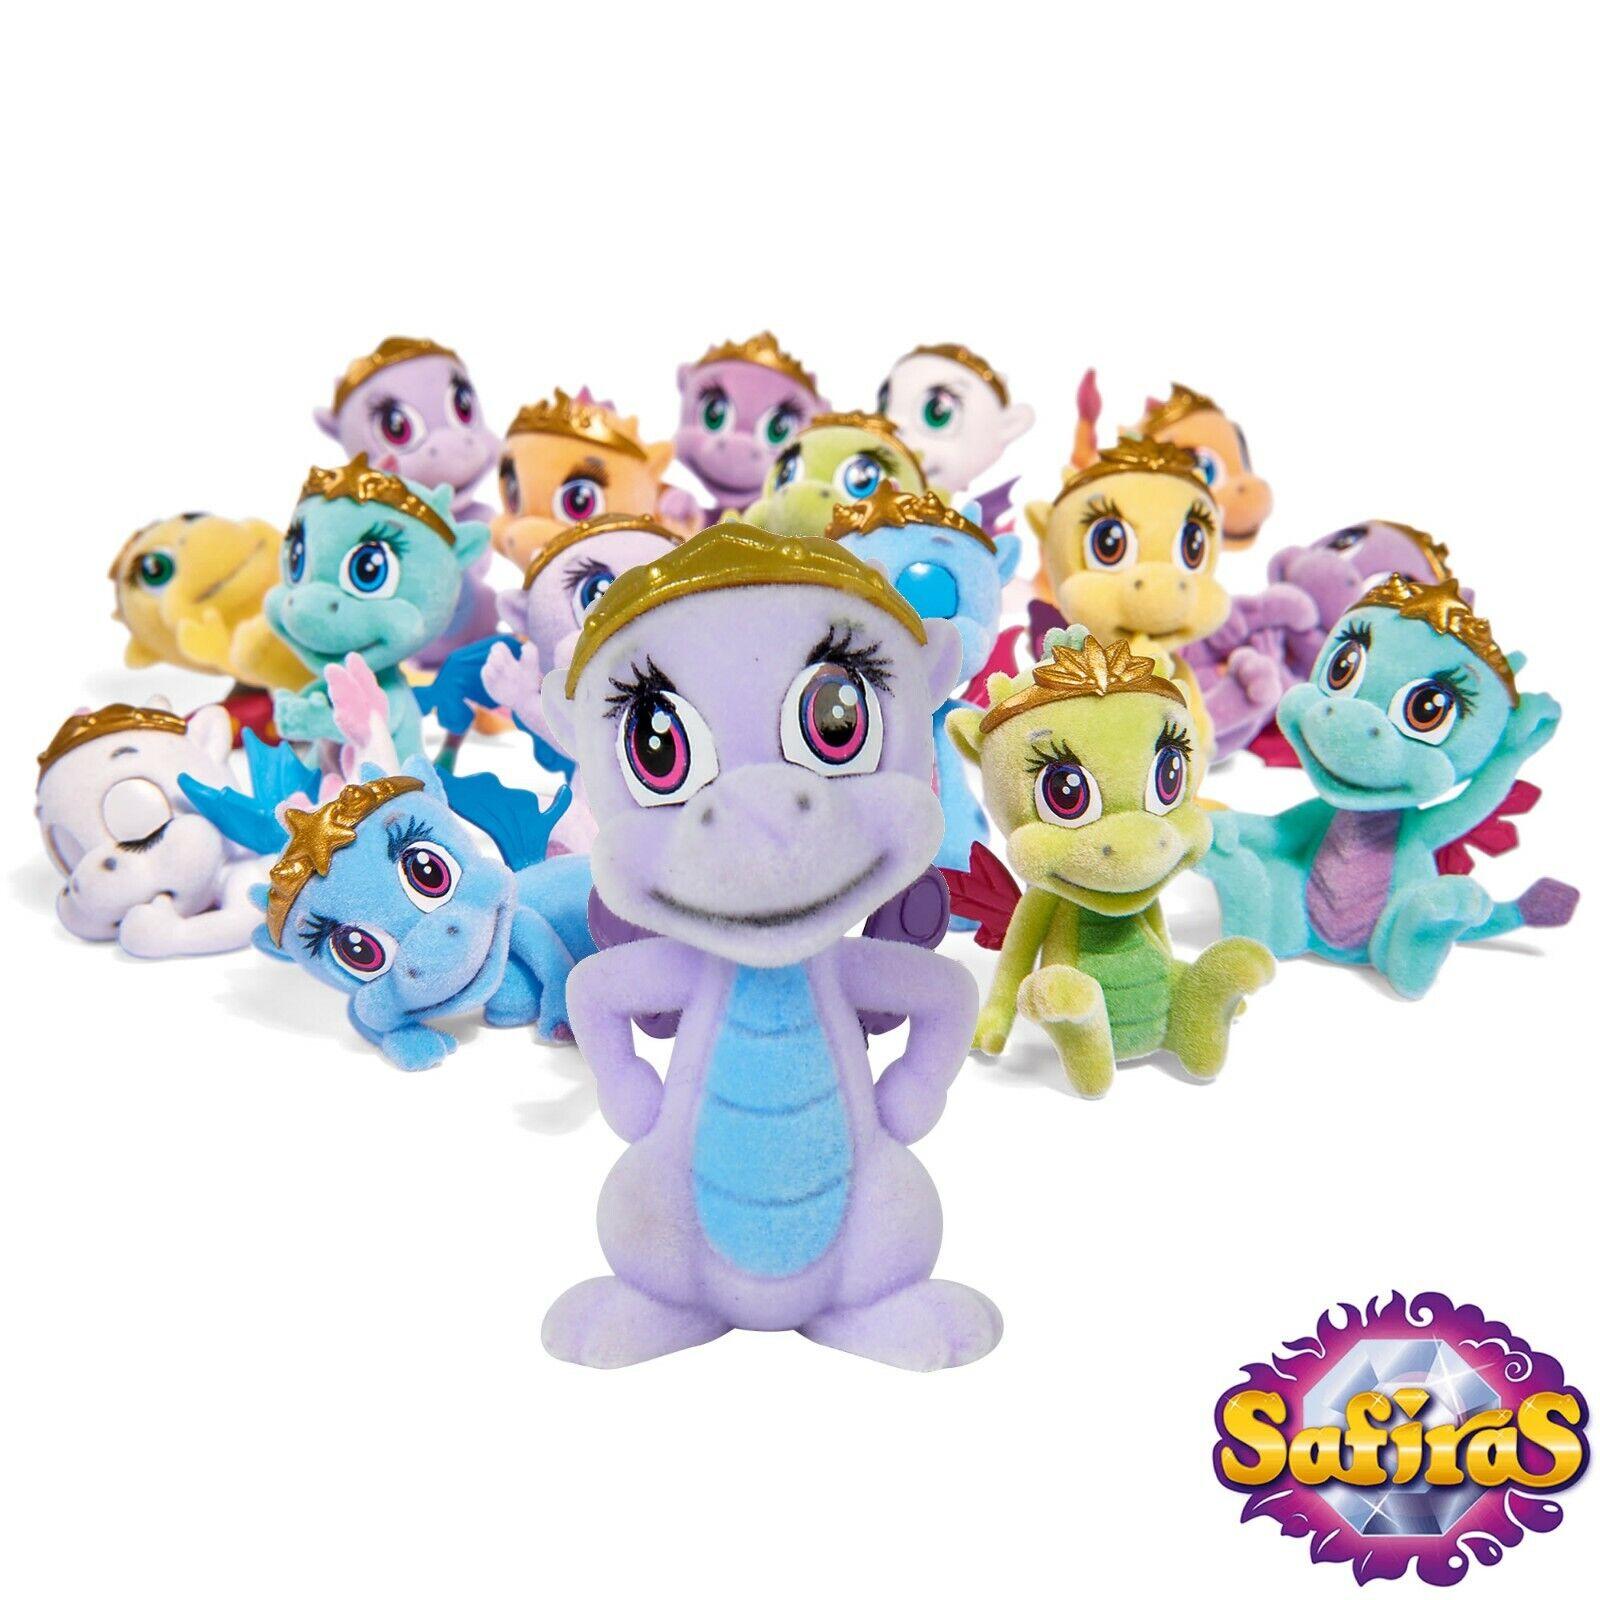 im Ei Sammelfigur Safira Drache Simba Nr.9 SAFIRAS IV Baby Princess 1 x ALMA